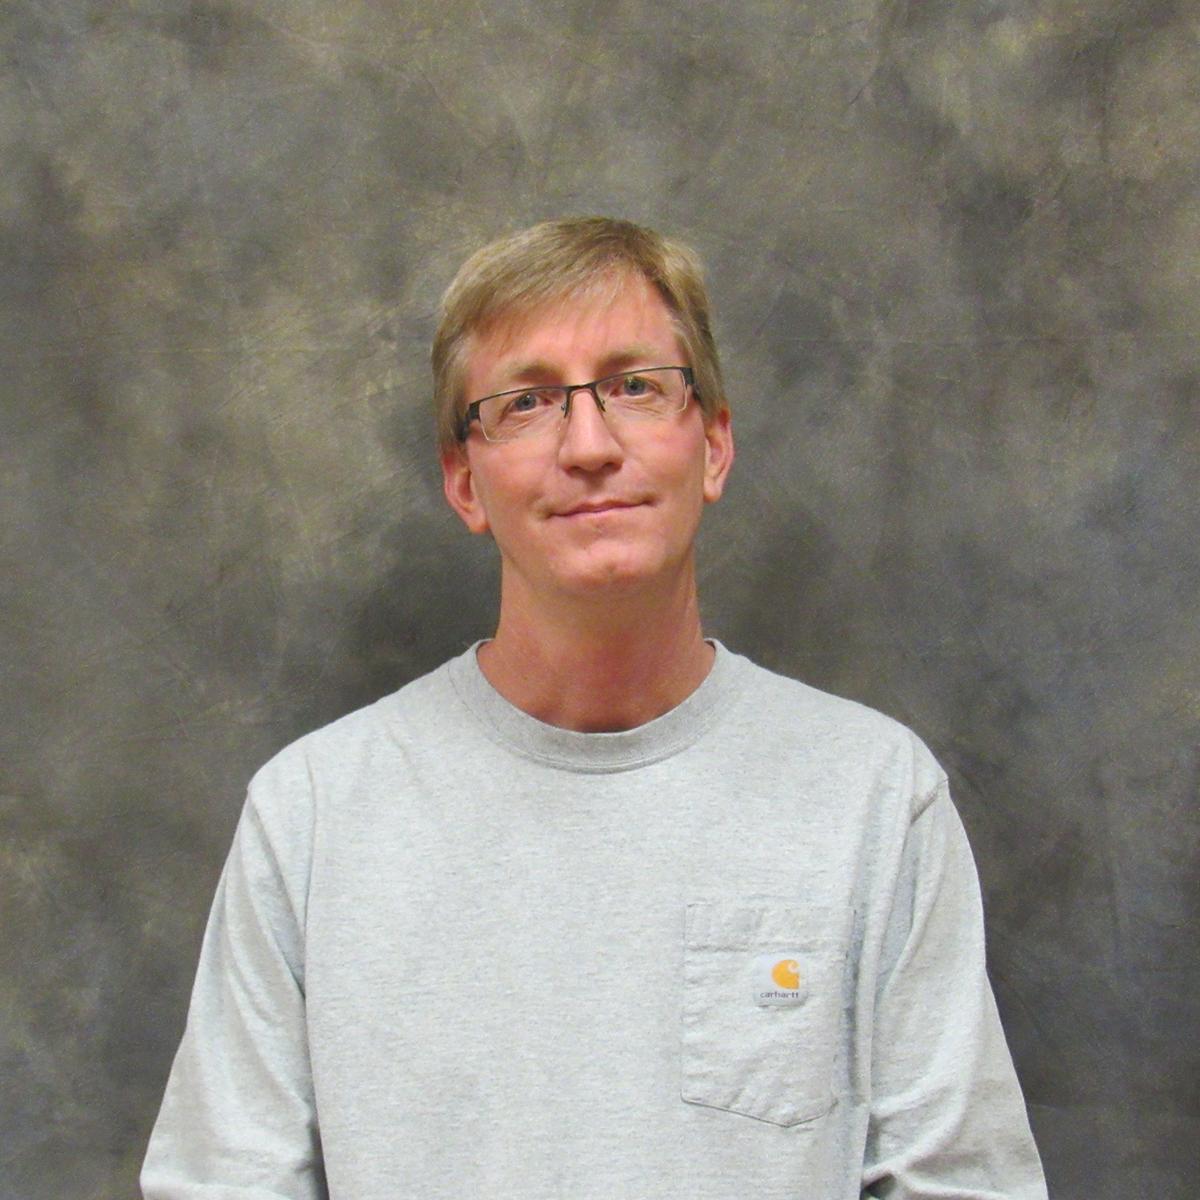 Rick Bugatsch<br>Commissioner